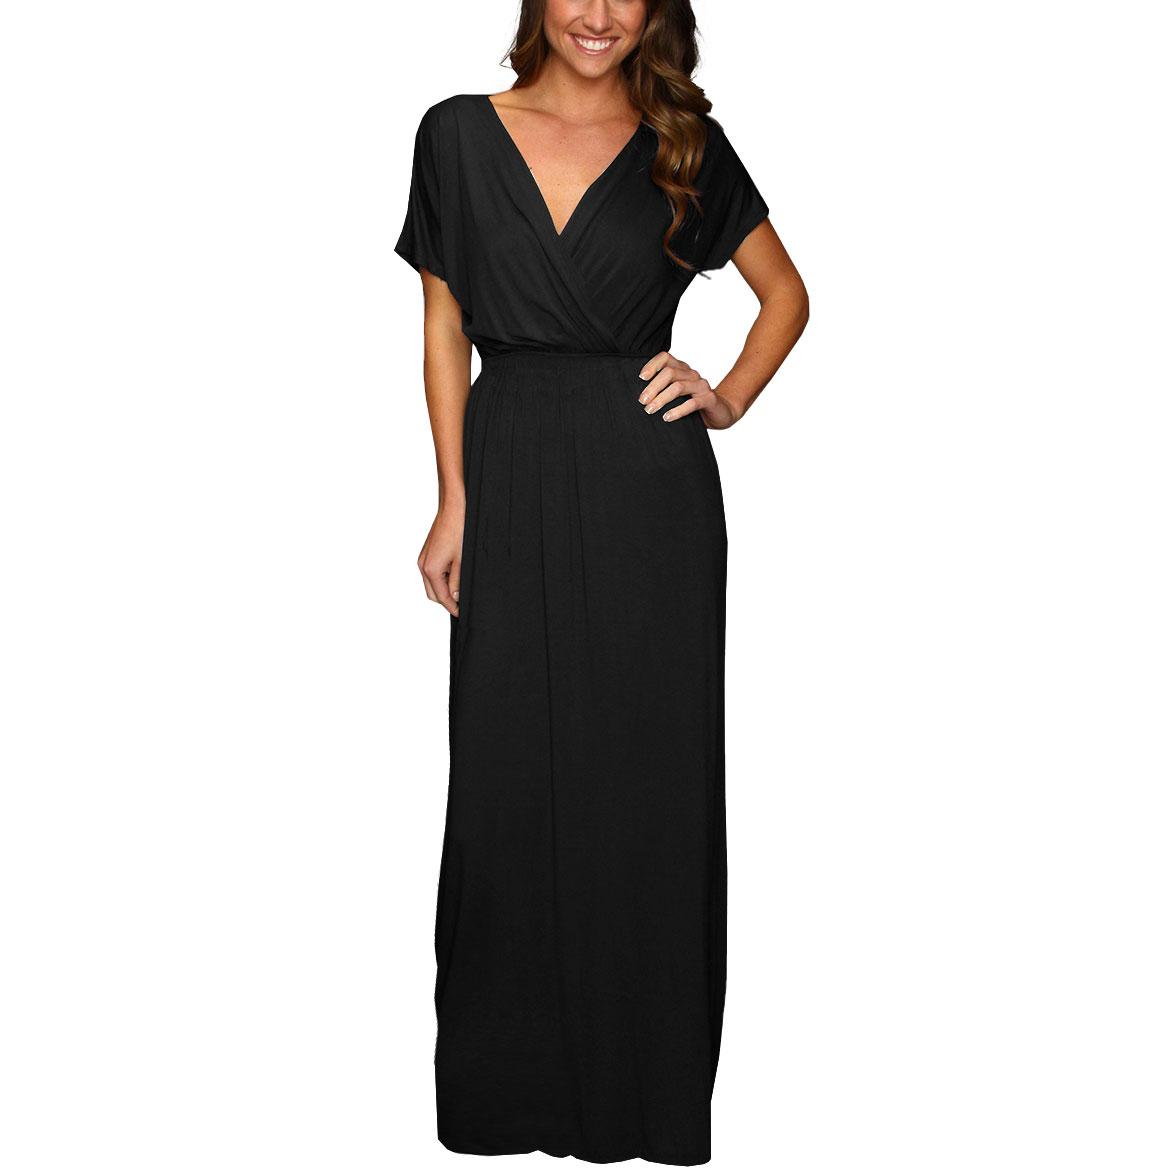 Long Jersey Maxi Dress & Make Your Evening Special